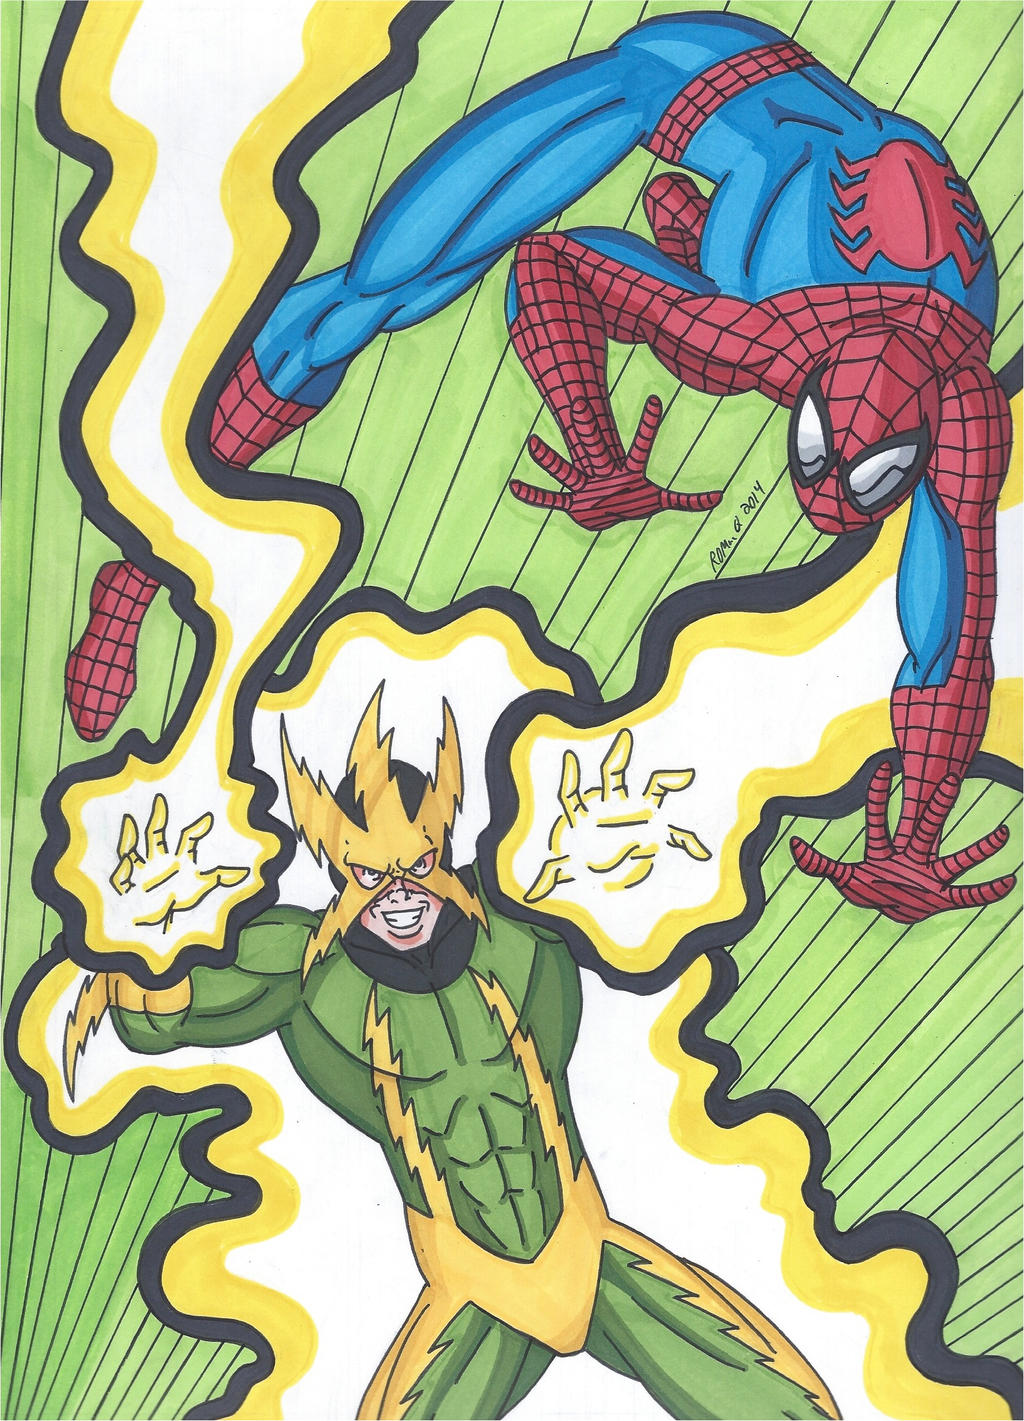 Electro Spider Man Wallpaper Spider-Man vs Electro ...